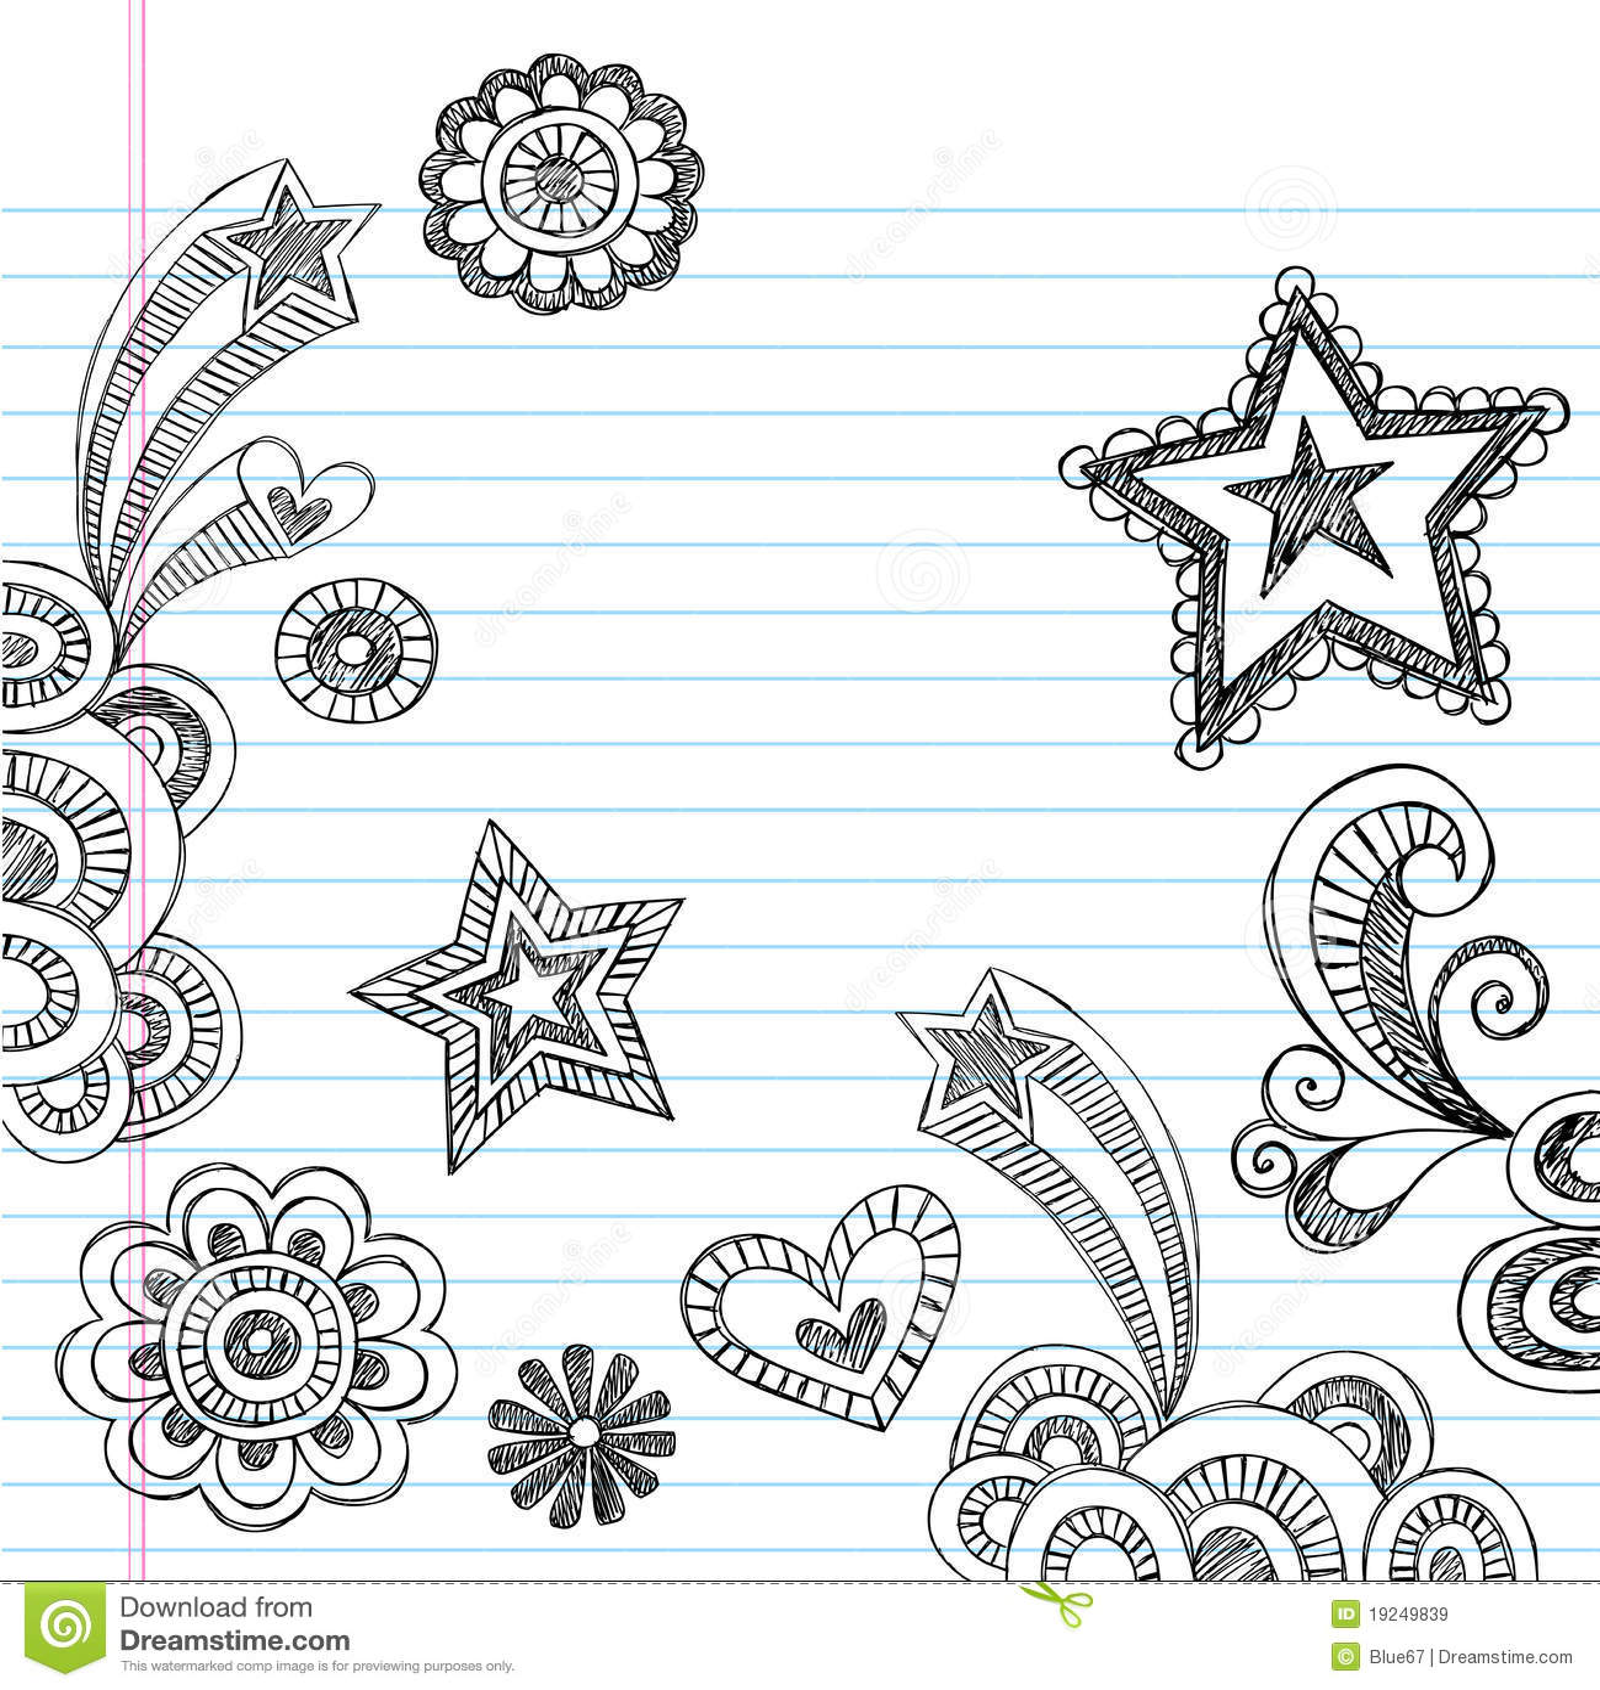 How To Draw Flower Designs On Paper Elis Dlugopisyreklamowe Co